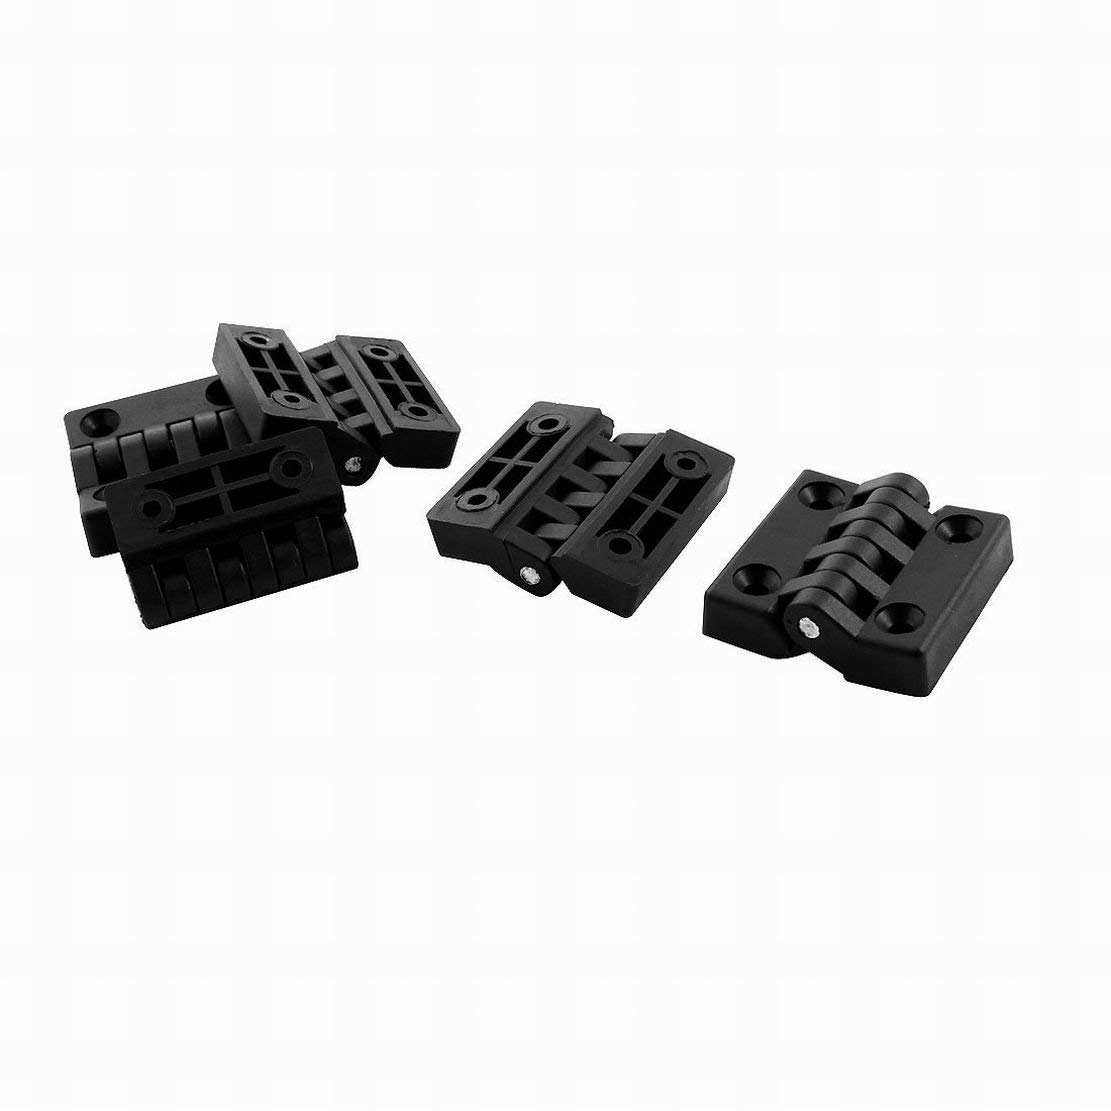 2 piece National Hardware S808-360 V8033 Door Hinges in Black 3-1//2